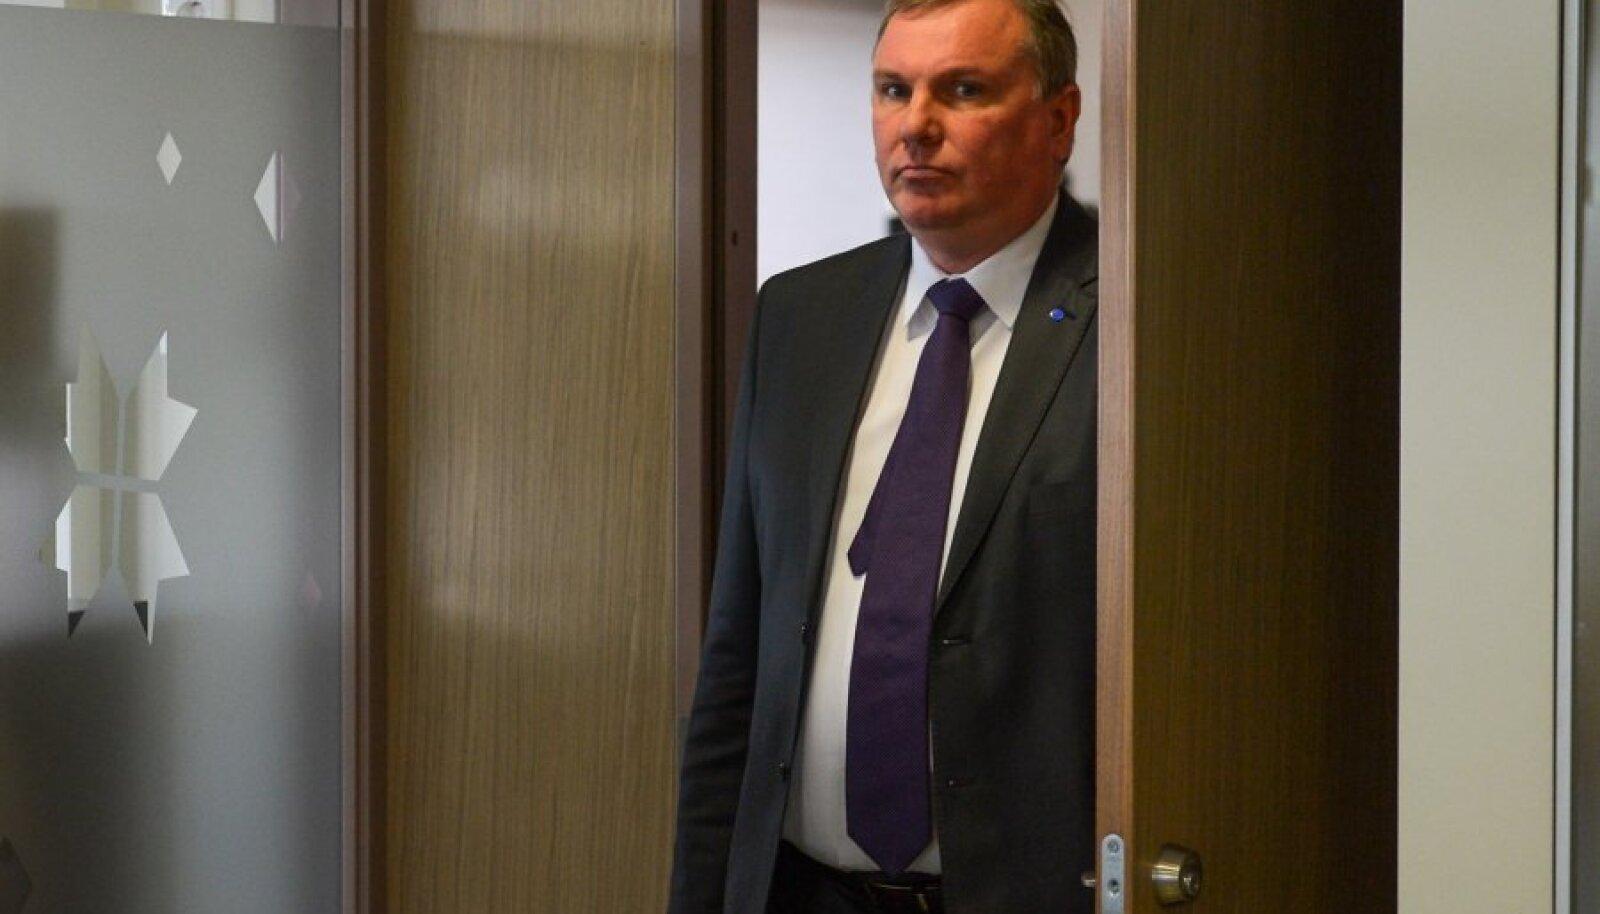 Kalev Lillo